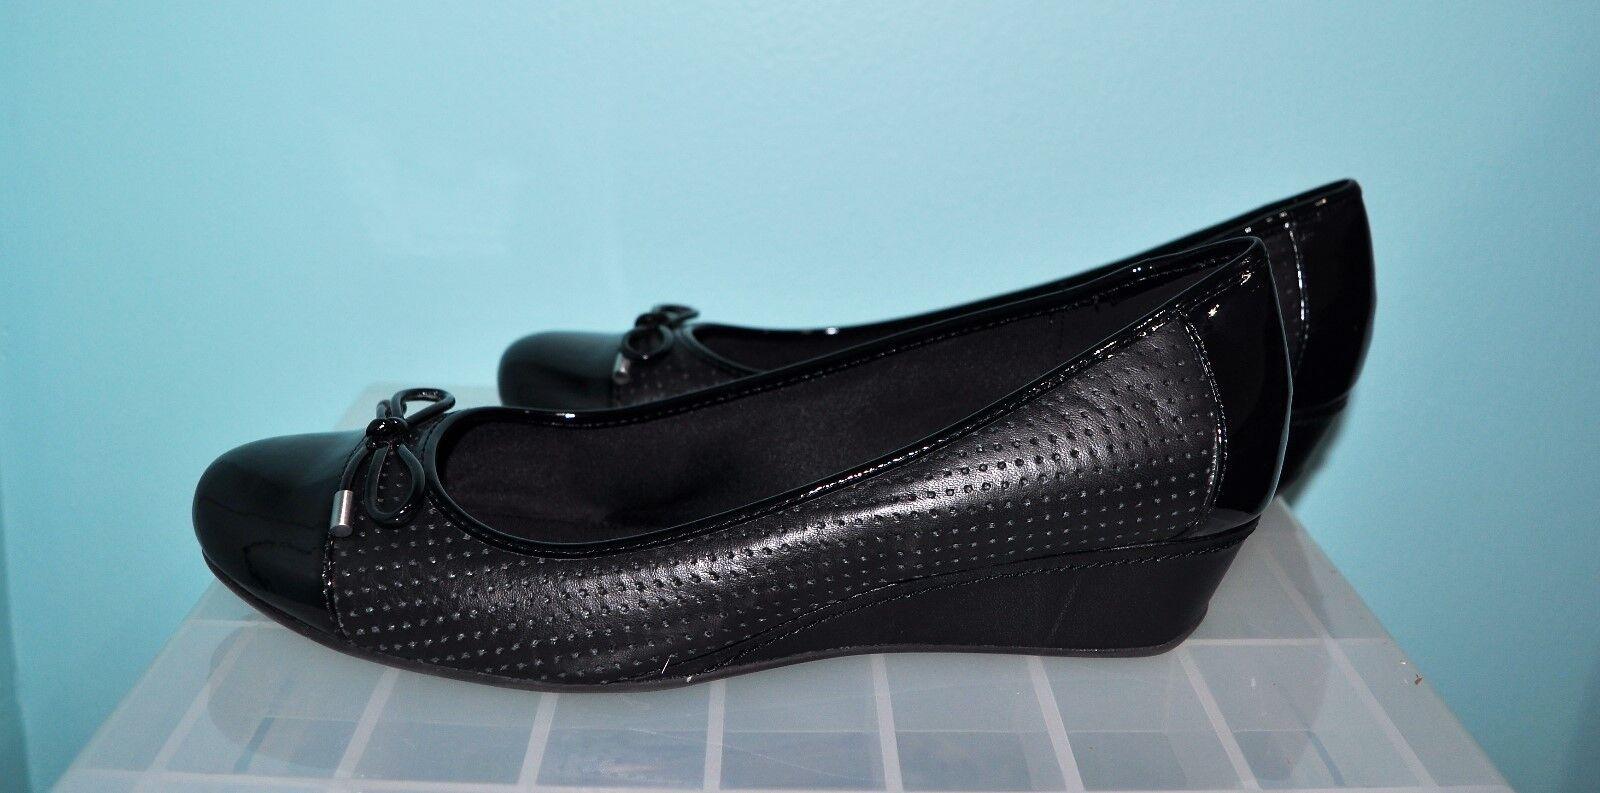 Black High Heel Shoe - Women's Size 8.5 Medium - Shoe EasySpirit Wedge Shoe 239f28